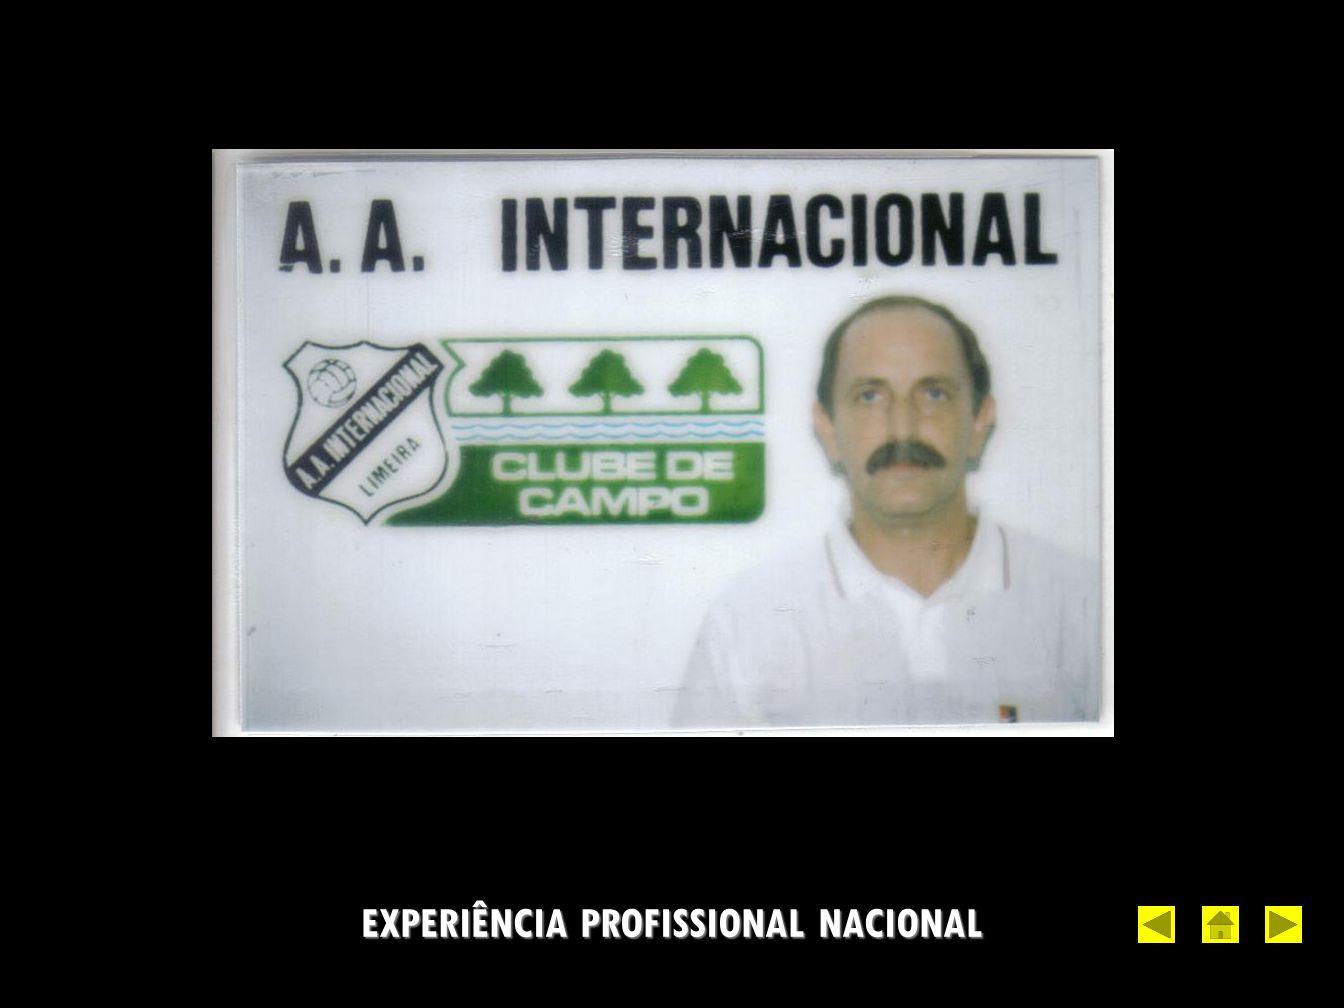 EXPERIÊNCIA PROFISSIONAL NACIONAL